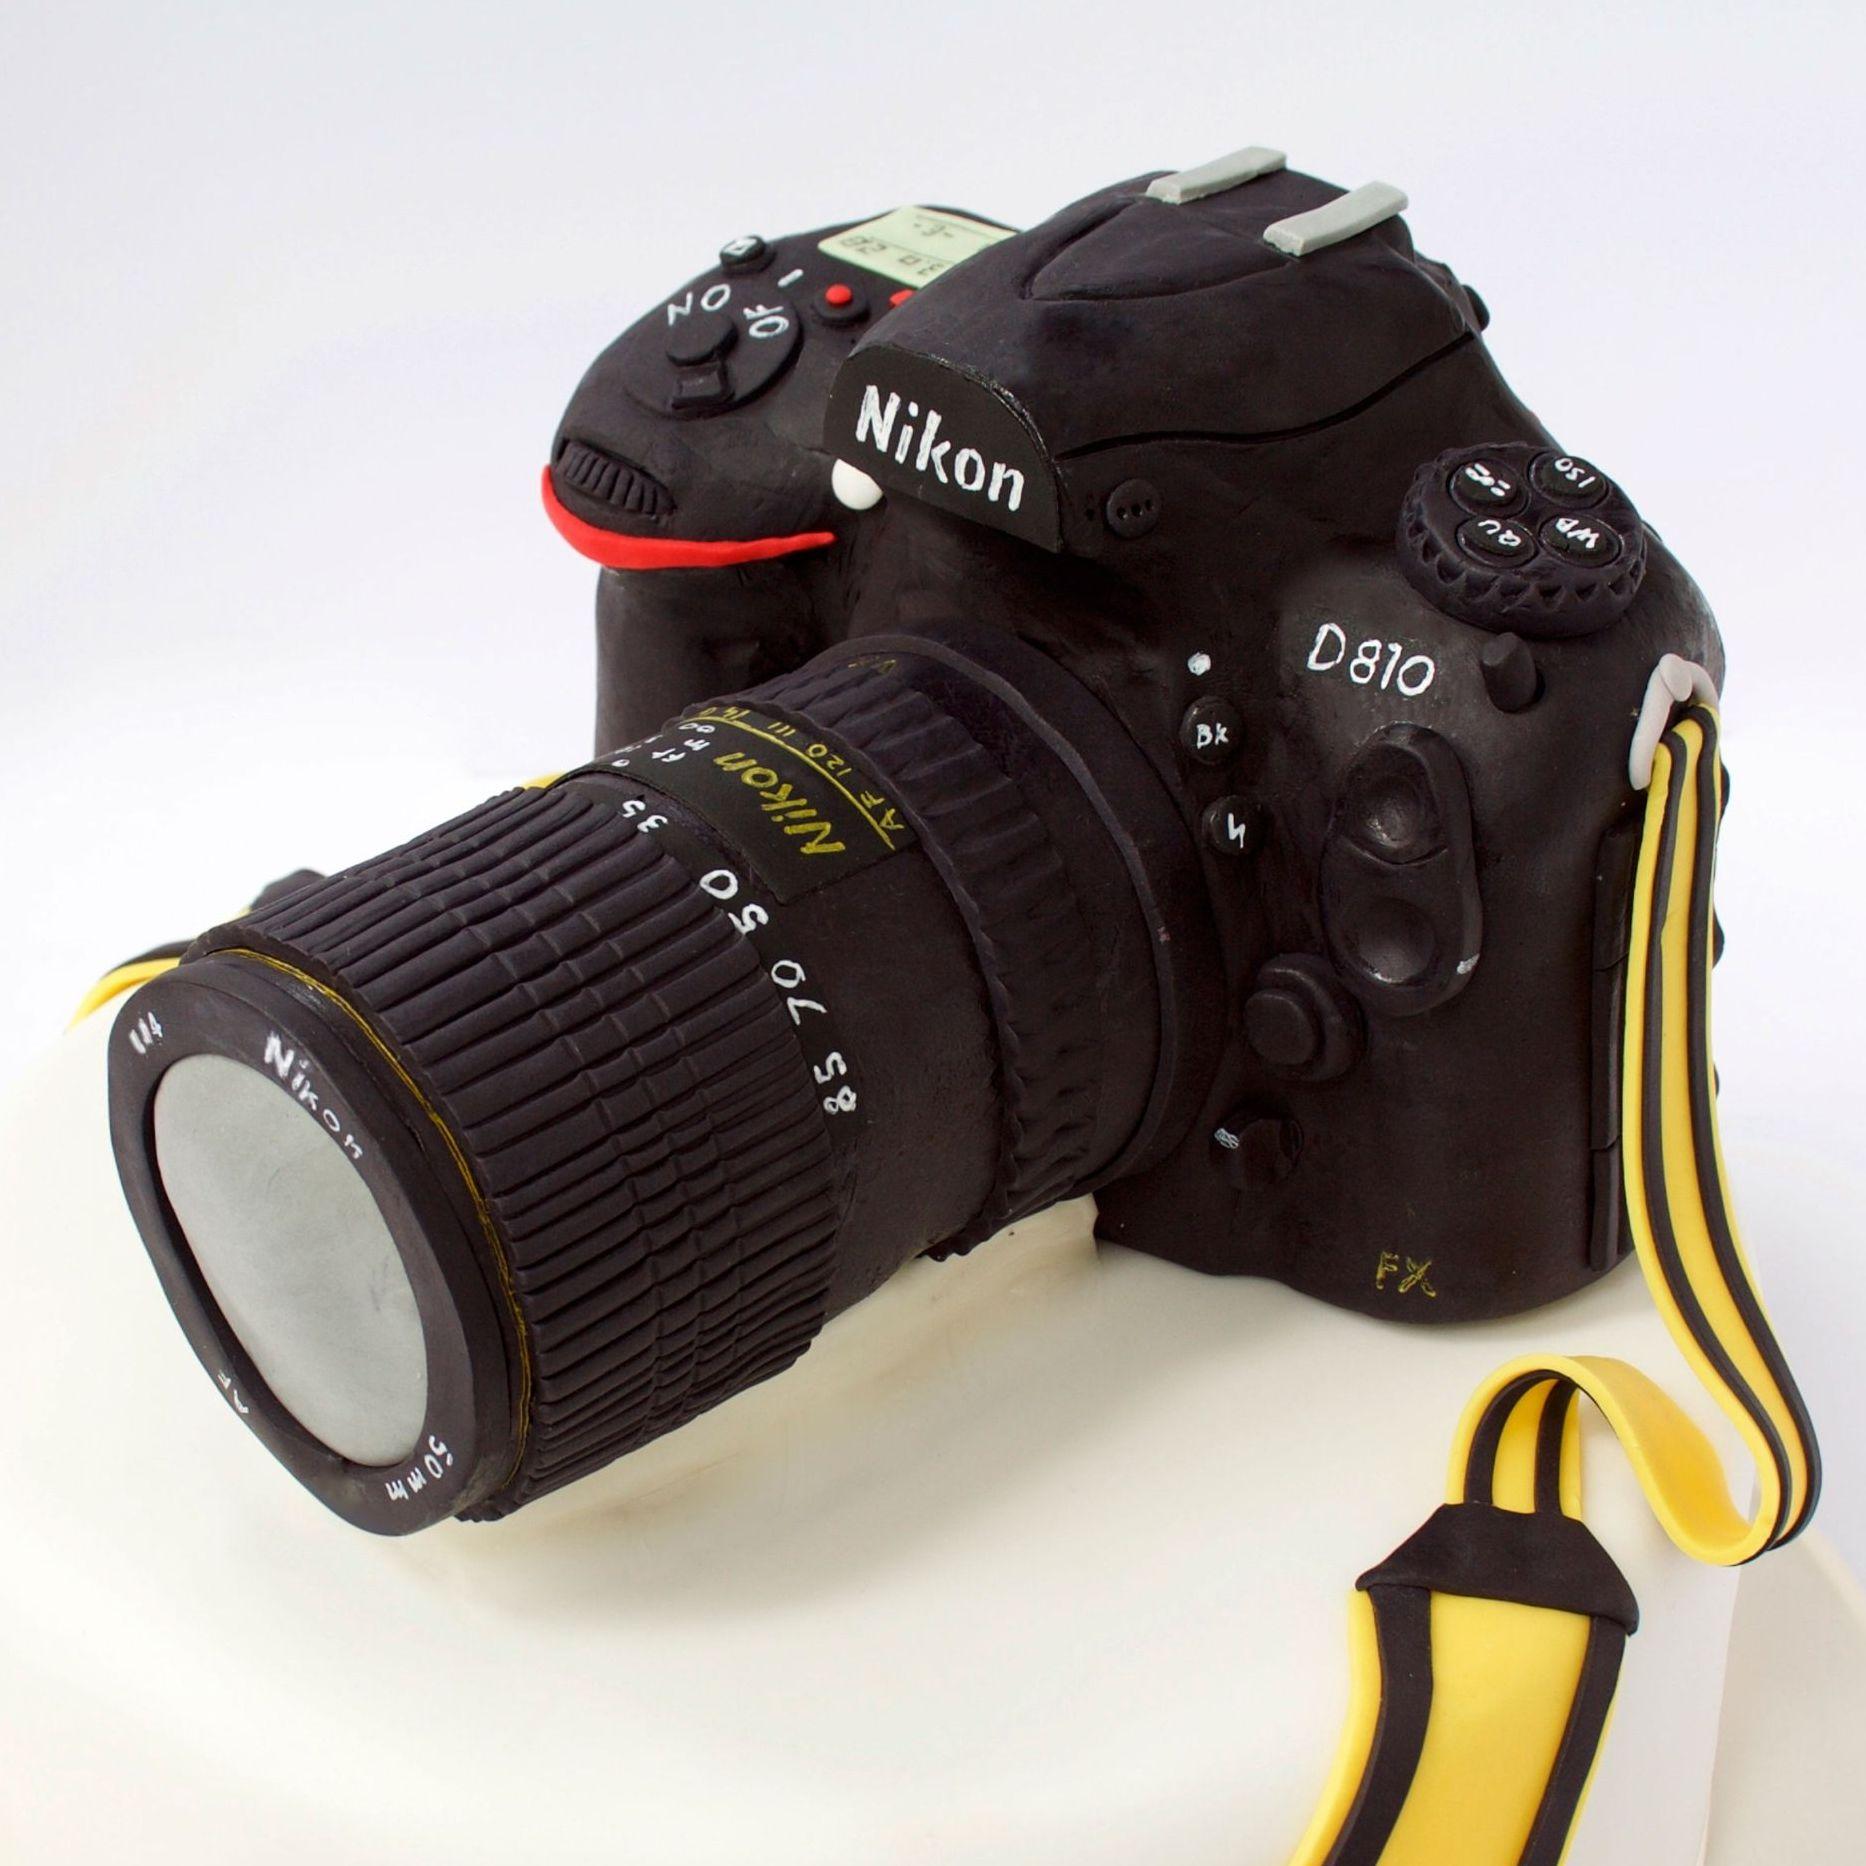 Nikon camera illusion cake